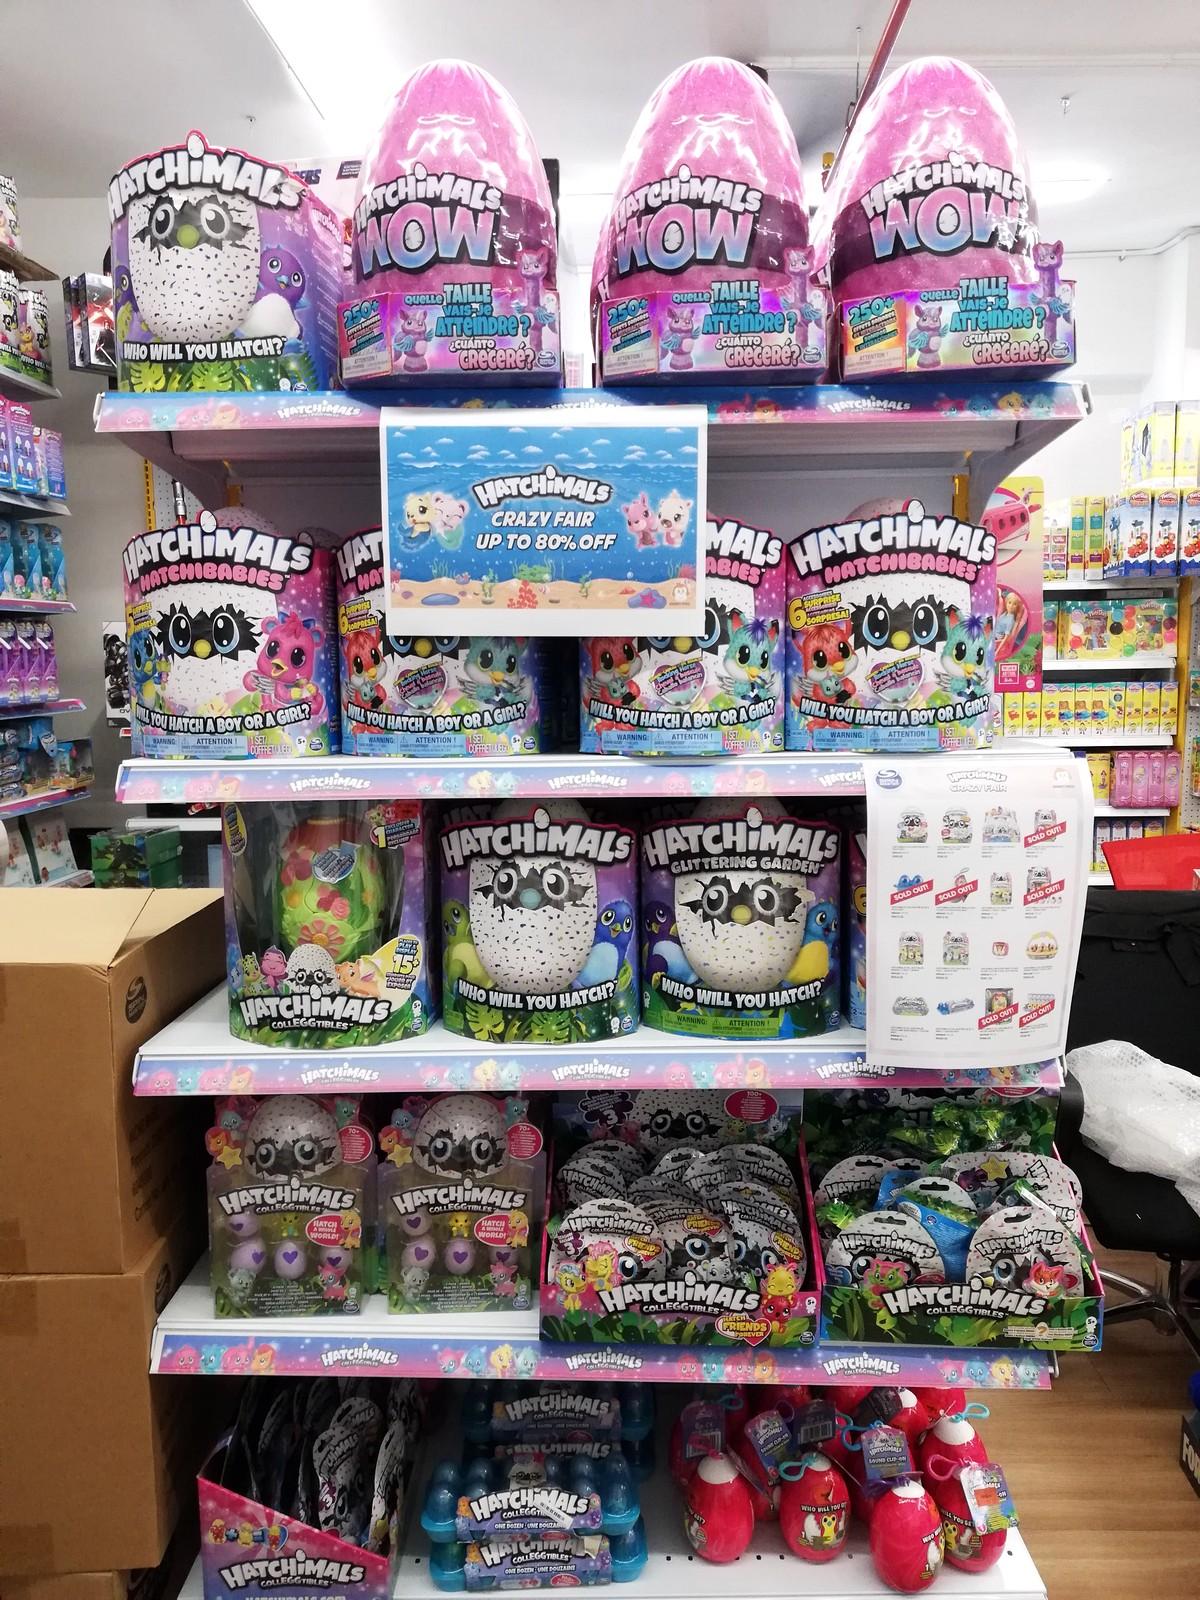 14-22-Mar-2020-Mighty-Utan-Warehouse-Sale-at-Petaling-Jaya-Up-to-90-off-LEGO-Hasbro-Mattel-Spin-Master-5 - Baby & Kids & Toys Education Johor Kedah Kelantan Kuala Lumpur Location Melaka Nationwide Negeri Sembilan Online Store Pahang Penang Perak Perlis Putrajaya Sabah Sarawak Selangor Terengganu Toys Warehouse Sale & Clearance in Malaysia